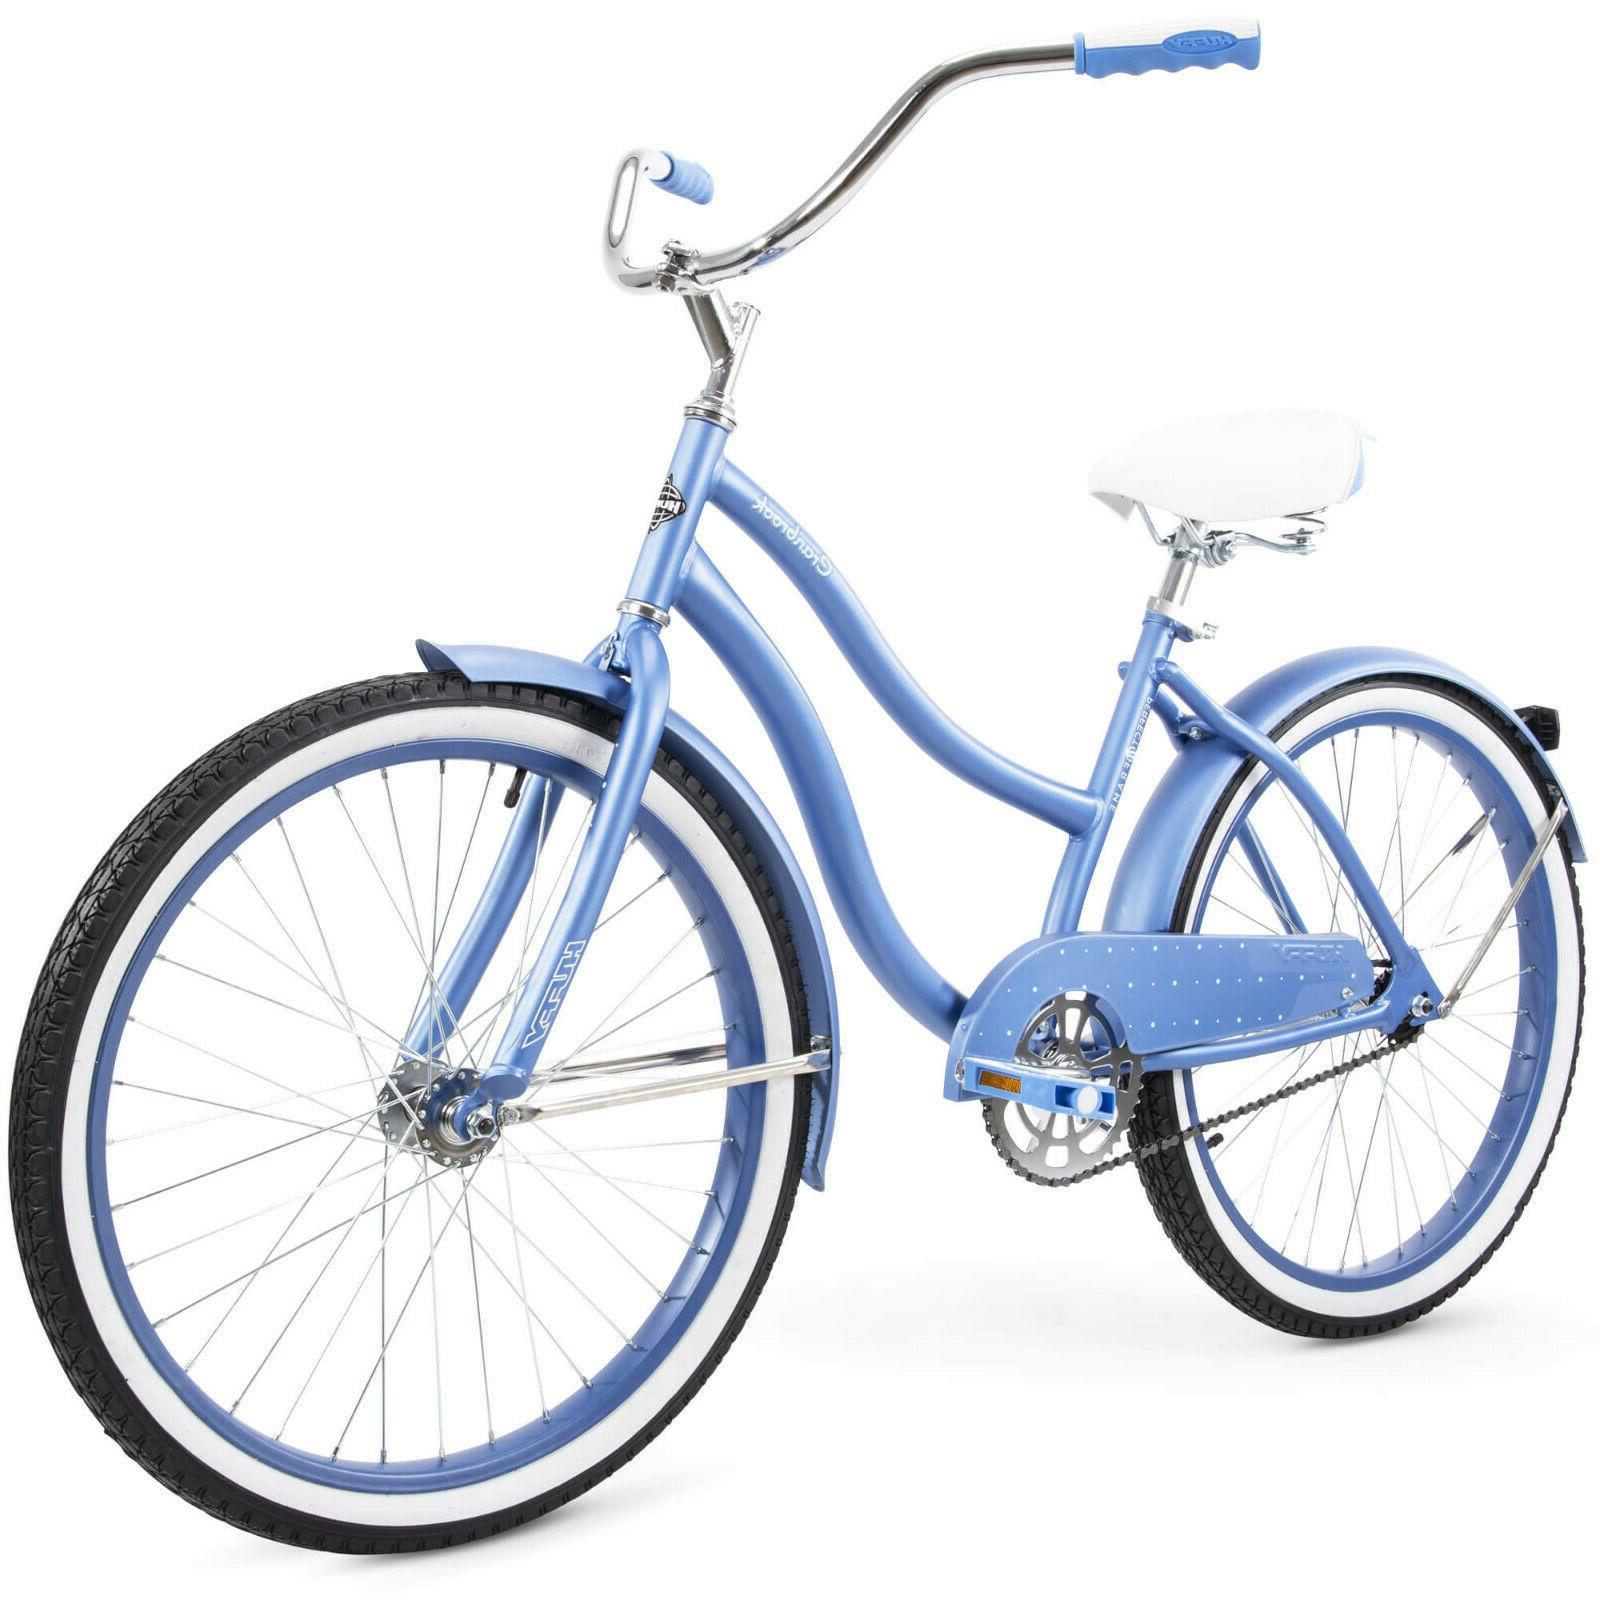 "Huffy 24"" Cranbrook Womens Girls Comfort Cruiser Bike Bicycl"